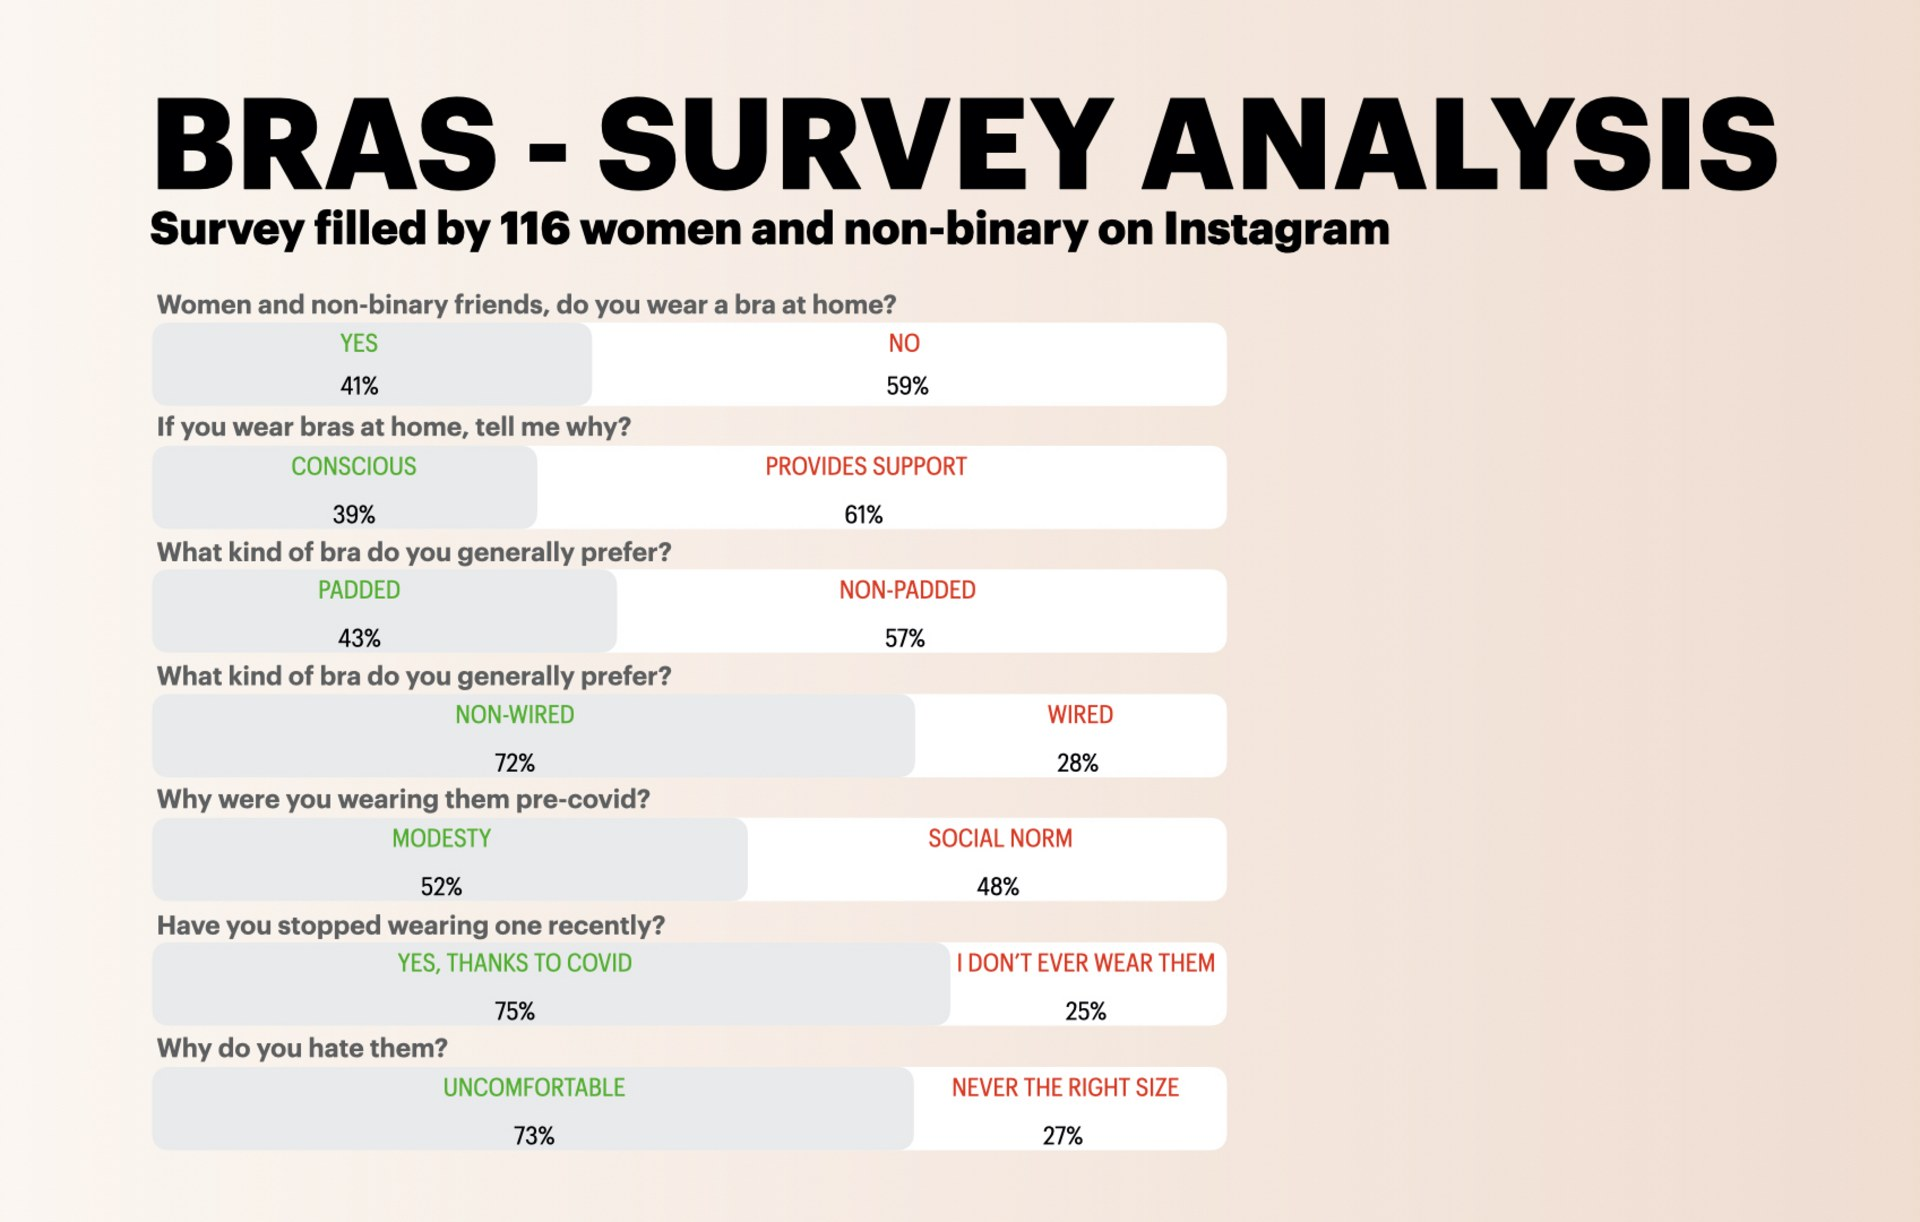 Initial Survey Analysis